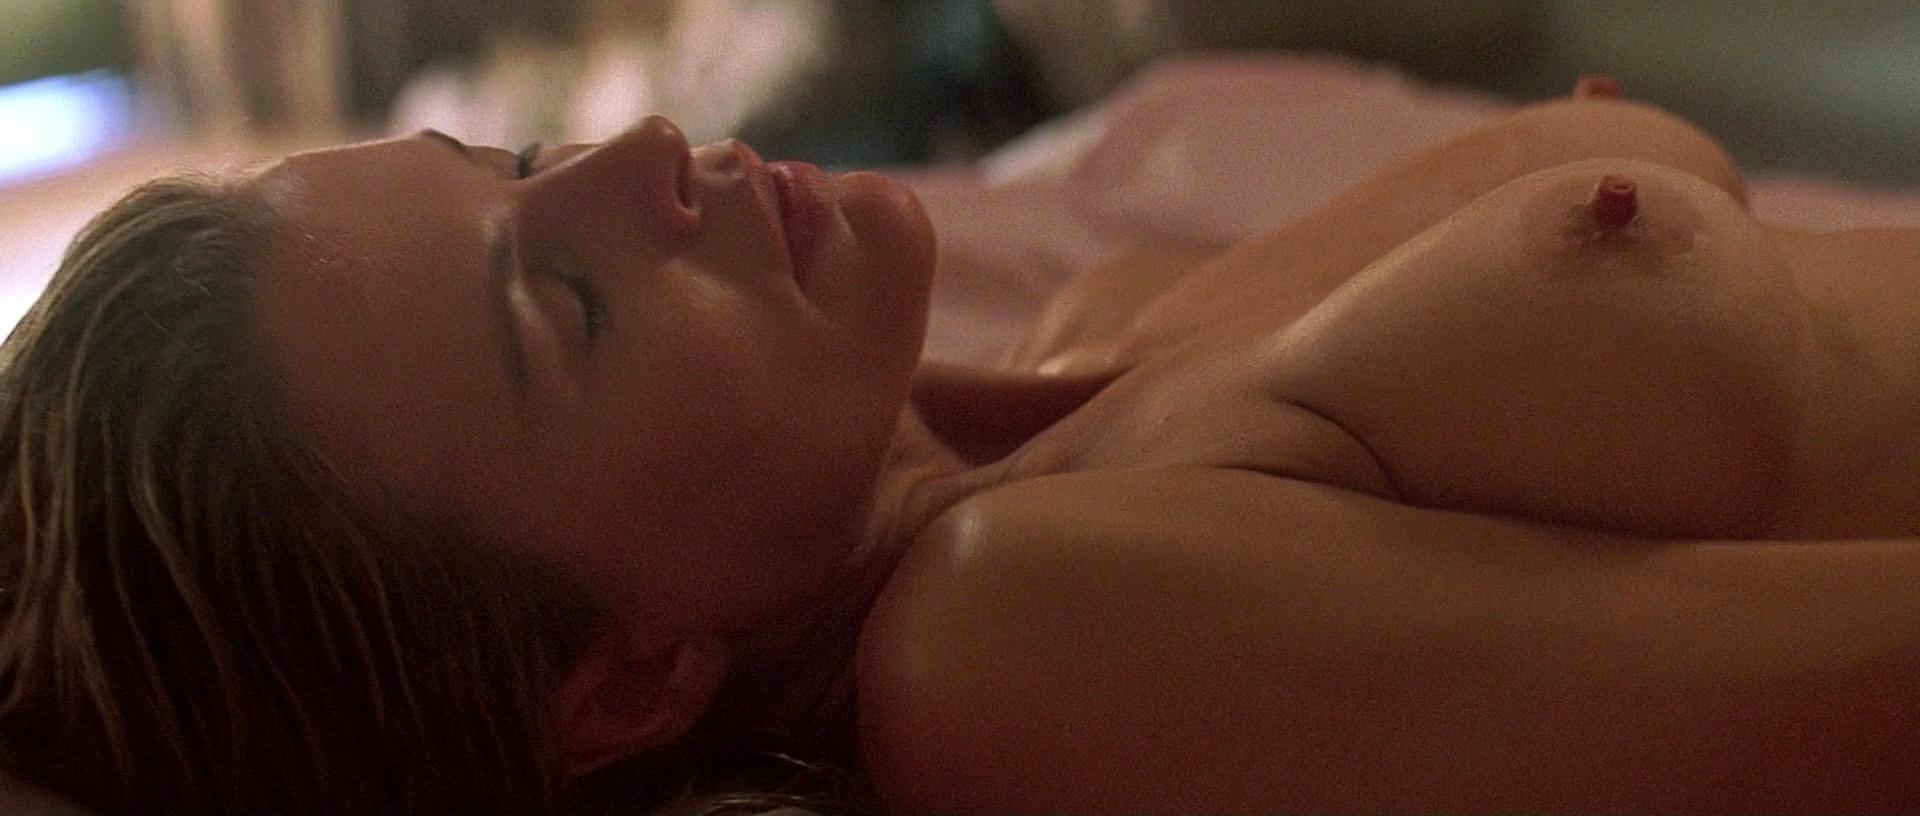 Sex download of getaway movie of kim basinger